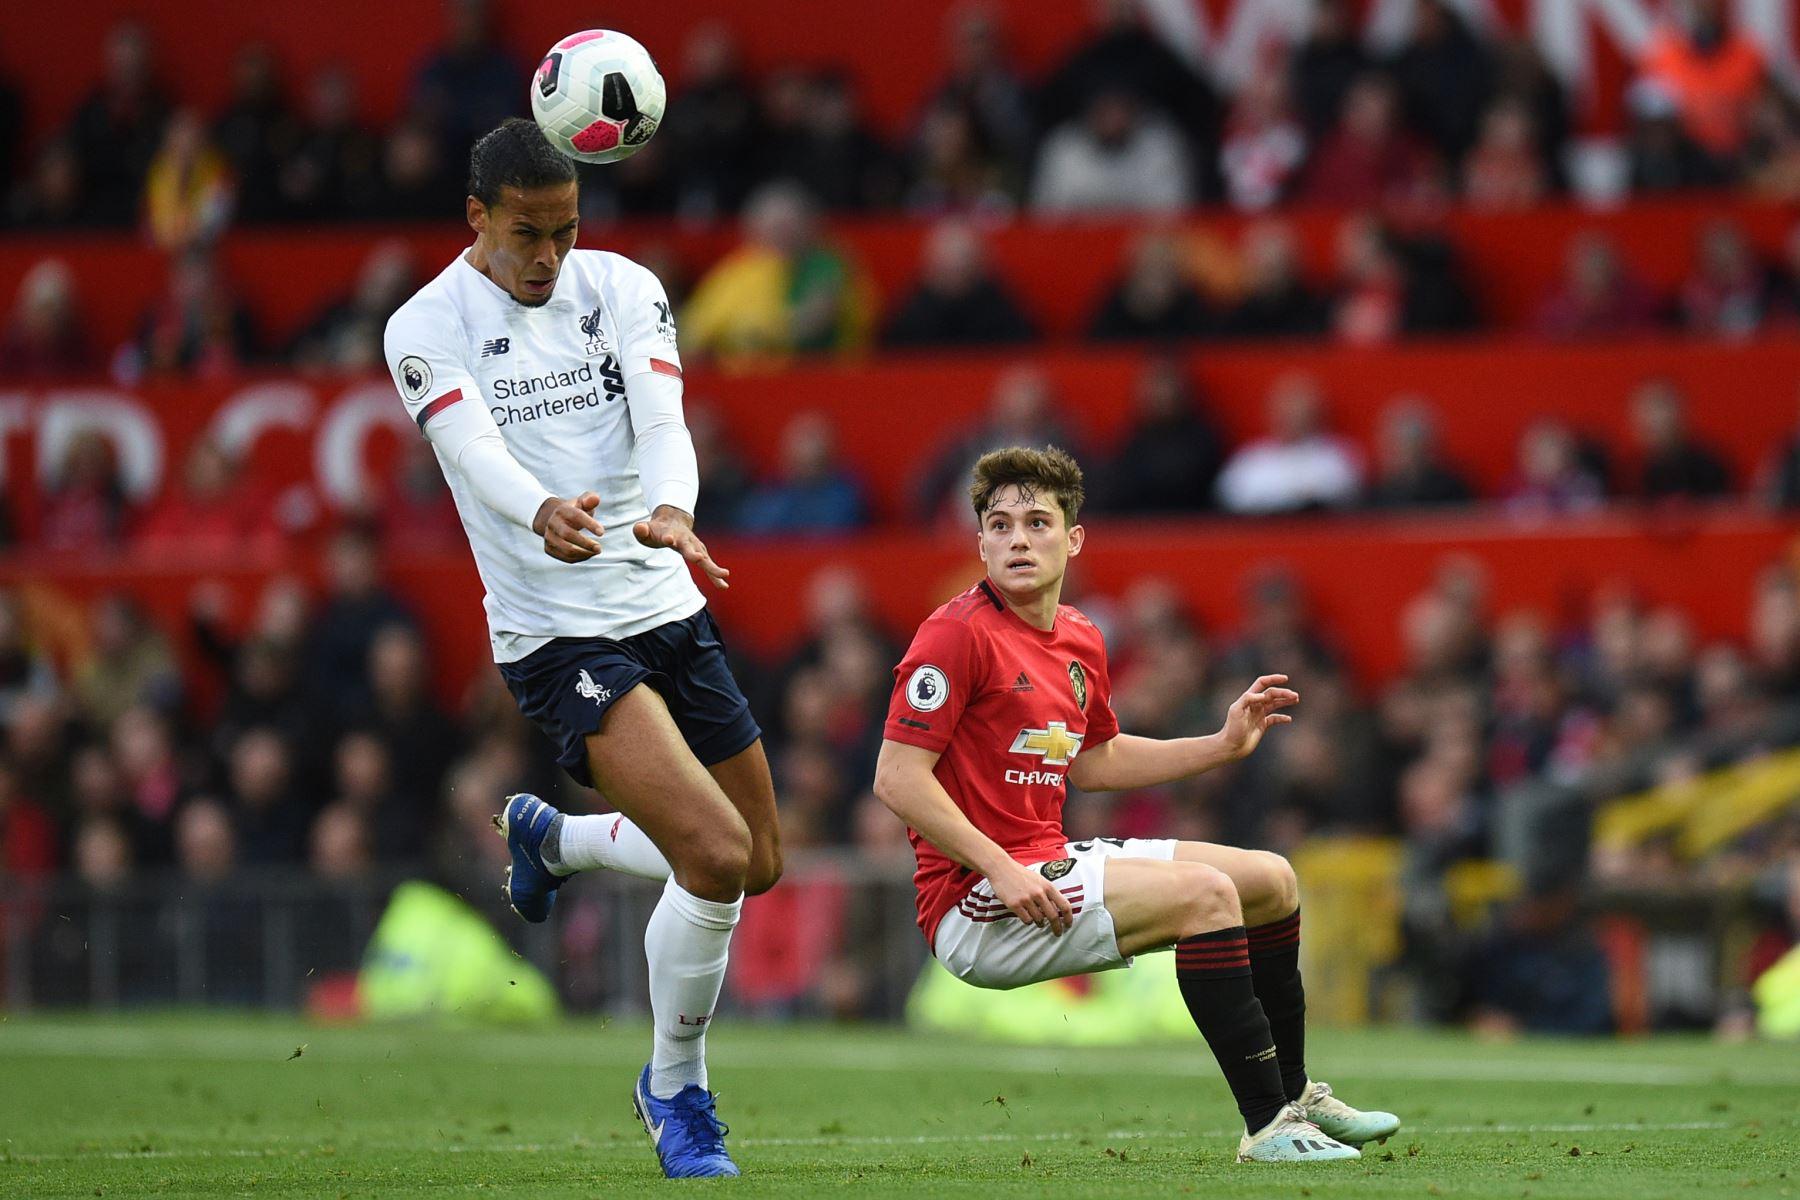 El defensor holandés del Liverpool Virgil van Dijk controla el balón con la cabeza ante marca del  centrocampista galés del Manchester United Daniel James en partido de Premier League. Foto: AFP